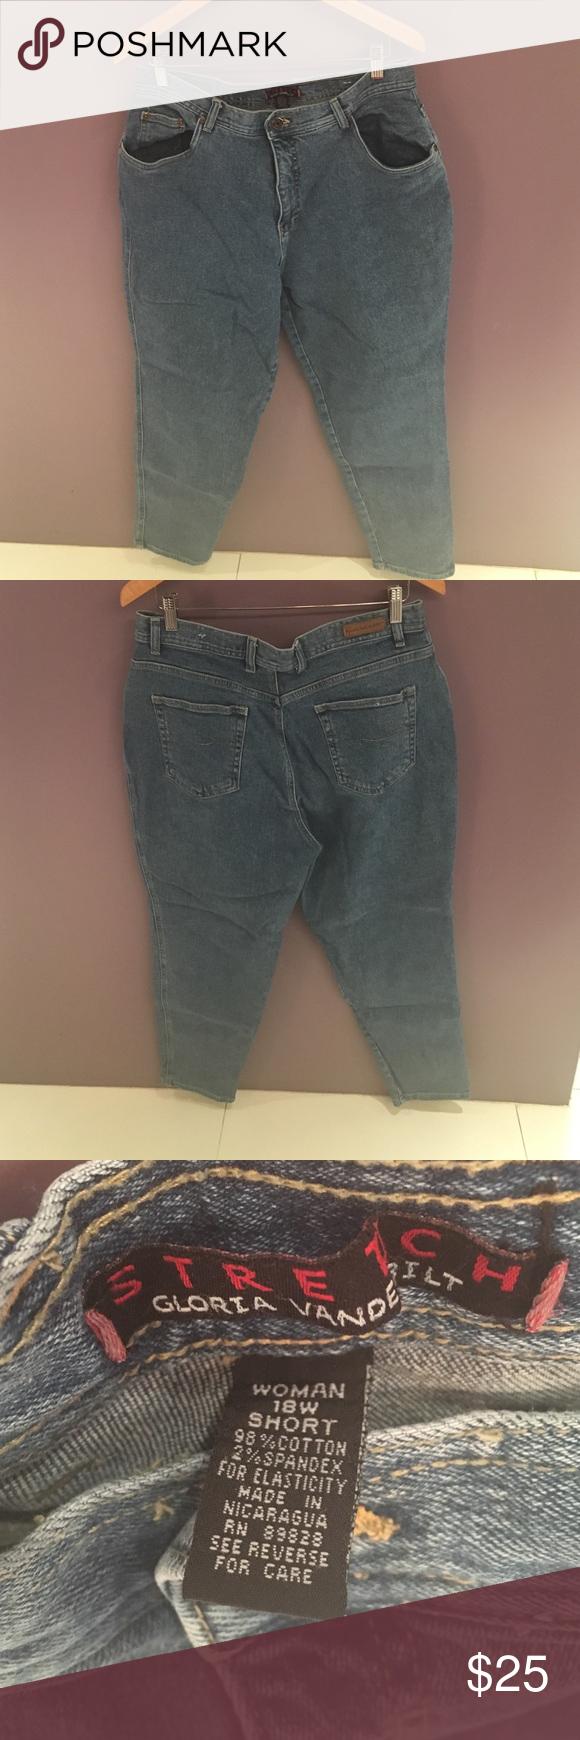 "Denim jeans Gloria Vanderbilt jeans. 5-pocket styling. Size 18W Short. Inseam 26-1/2"". Gloria Vanderbilt Jeans"